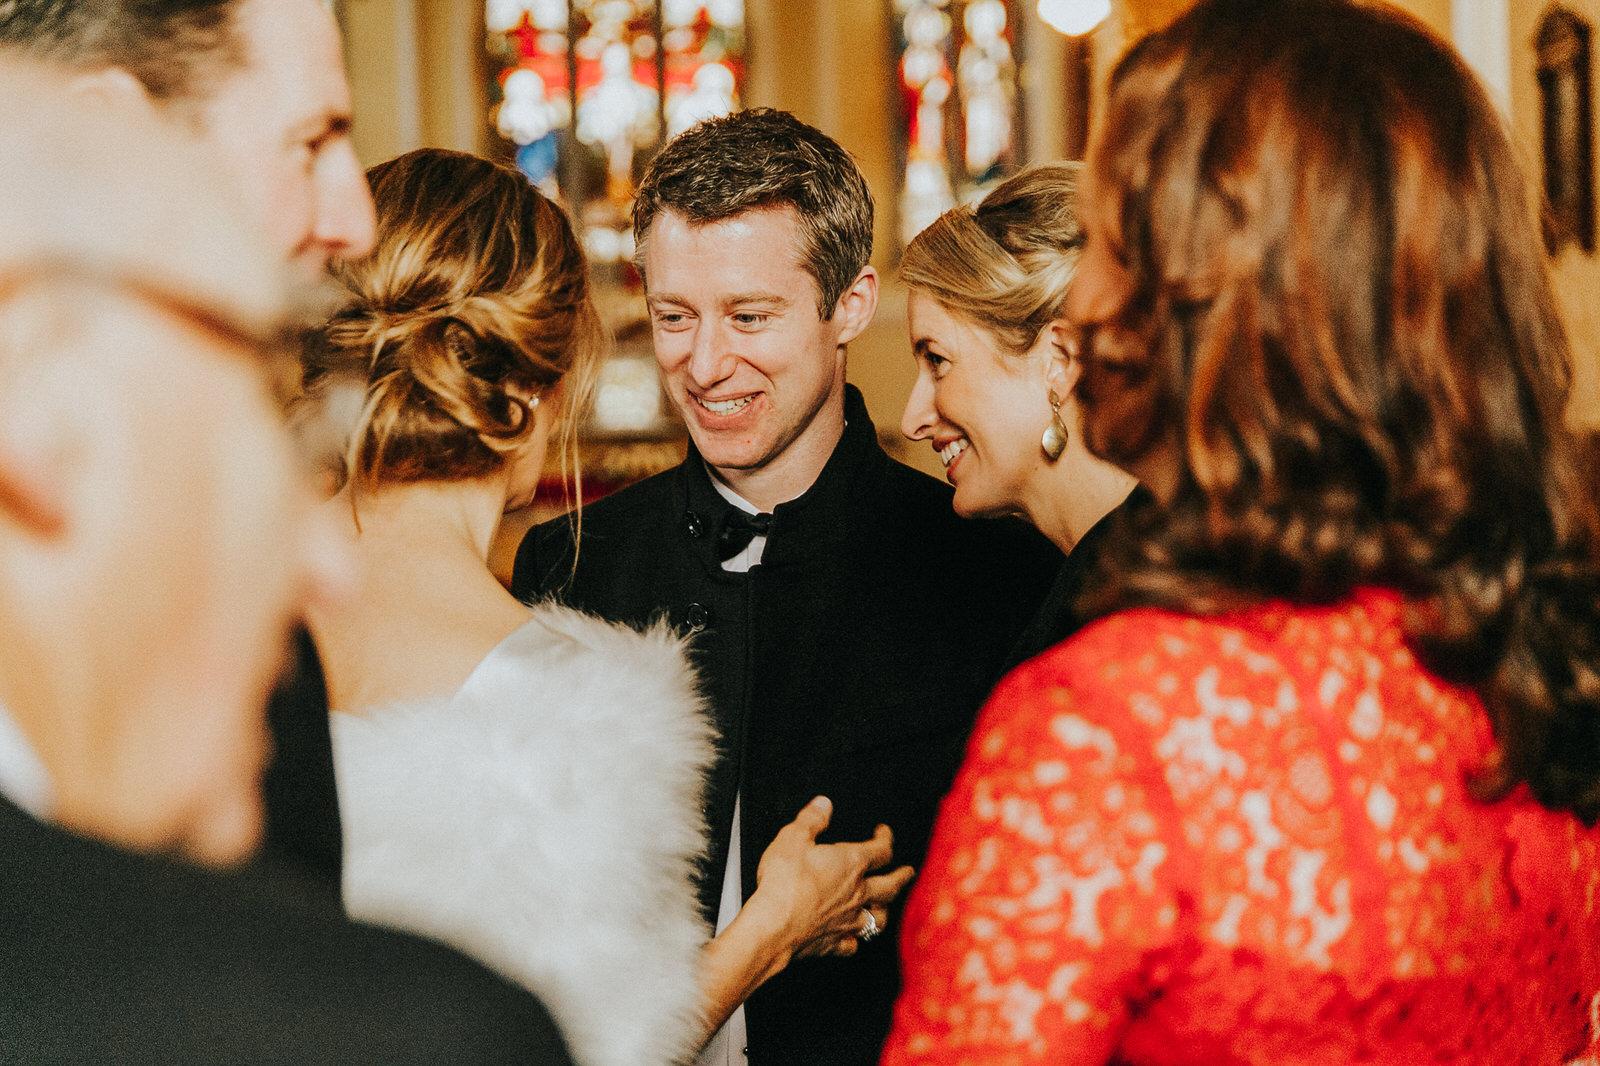 Dunbrody_House_Wedding_photographer_093.jpg